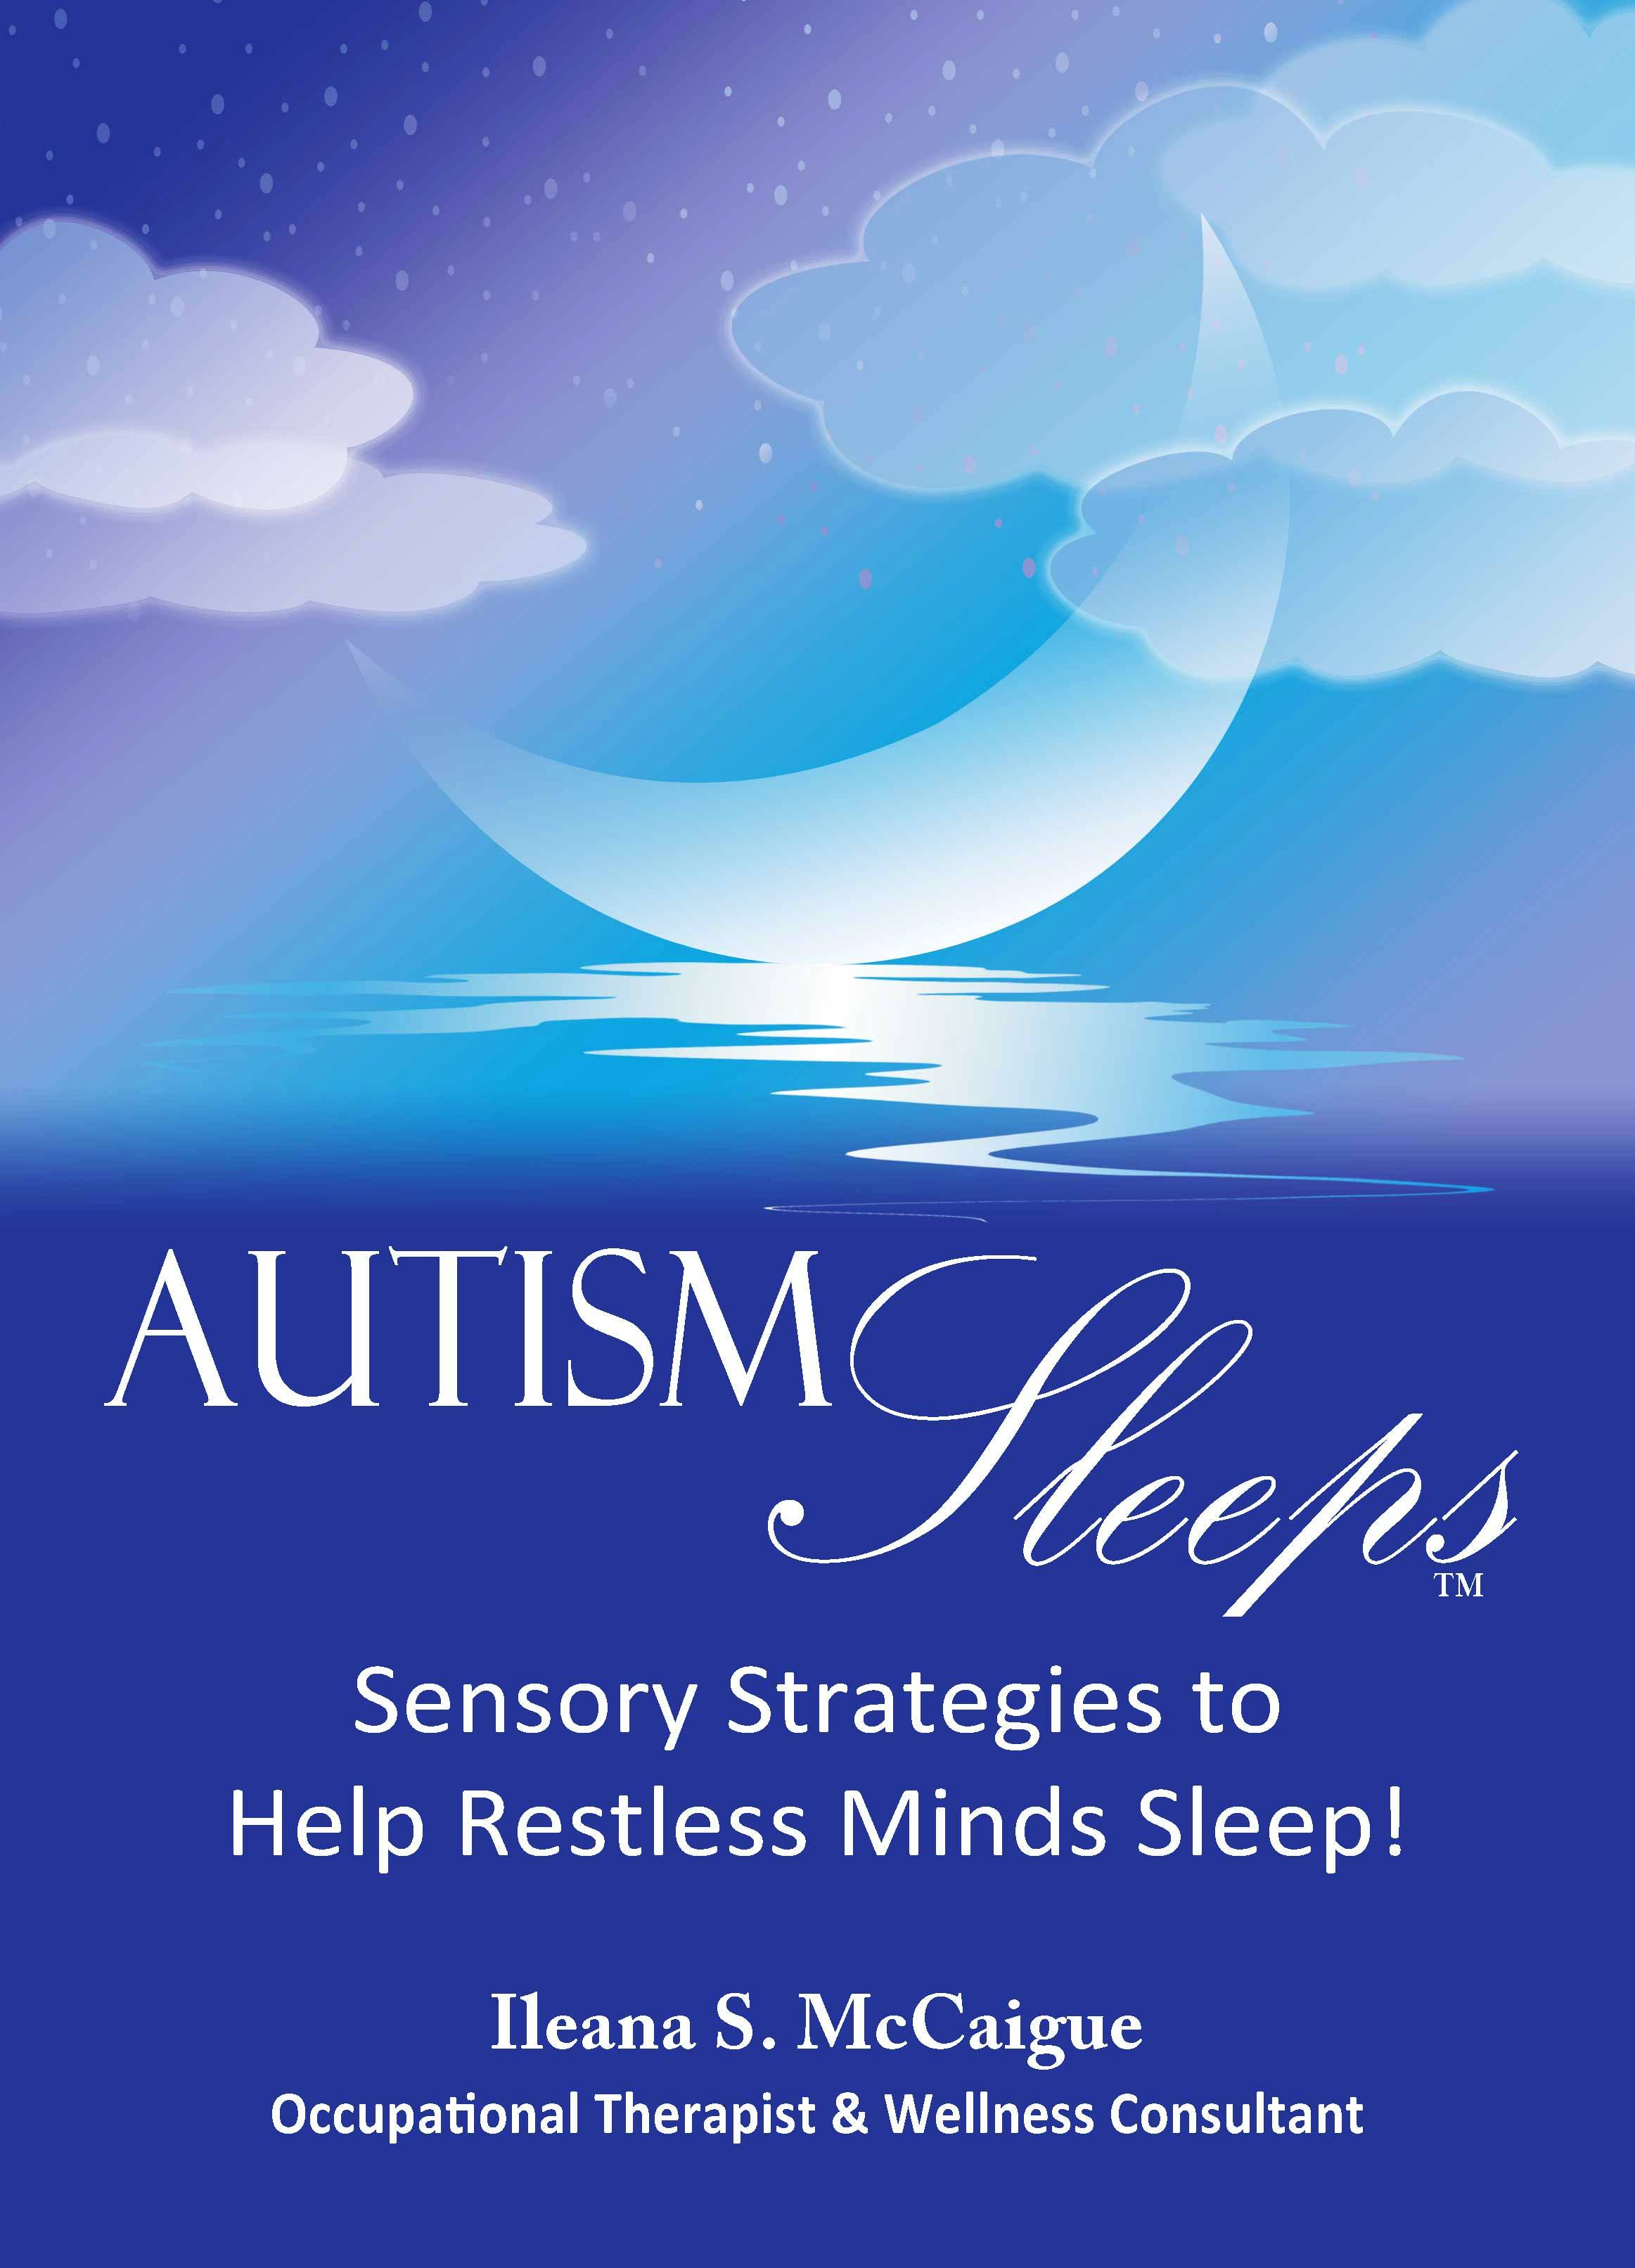 Autism Sleeps from https://yourtherapysource.com/autismsleeps.html